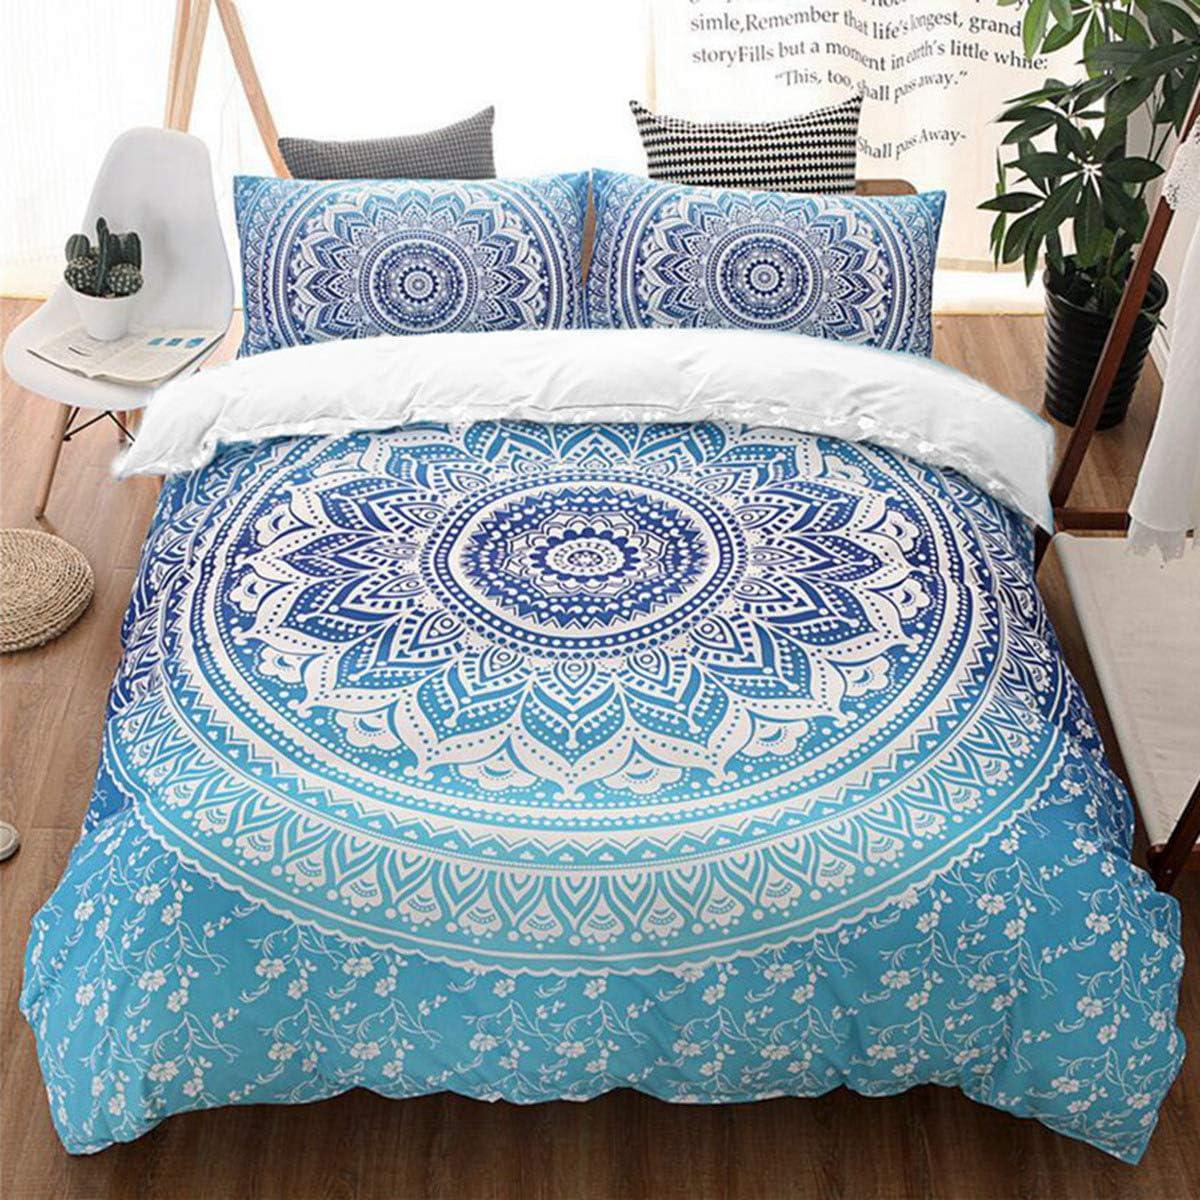 "Bohemian Bedding Set Blue Mandala Duvet Cover Set Soft Mircrofiber Boho Chic Duvet Cover with Zipper Closure (Queen, 3 Pieces) 90"" x 90"""